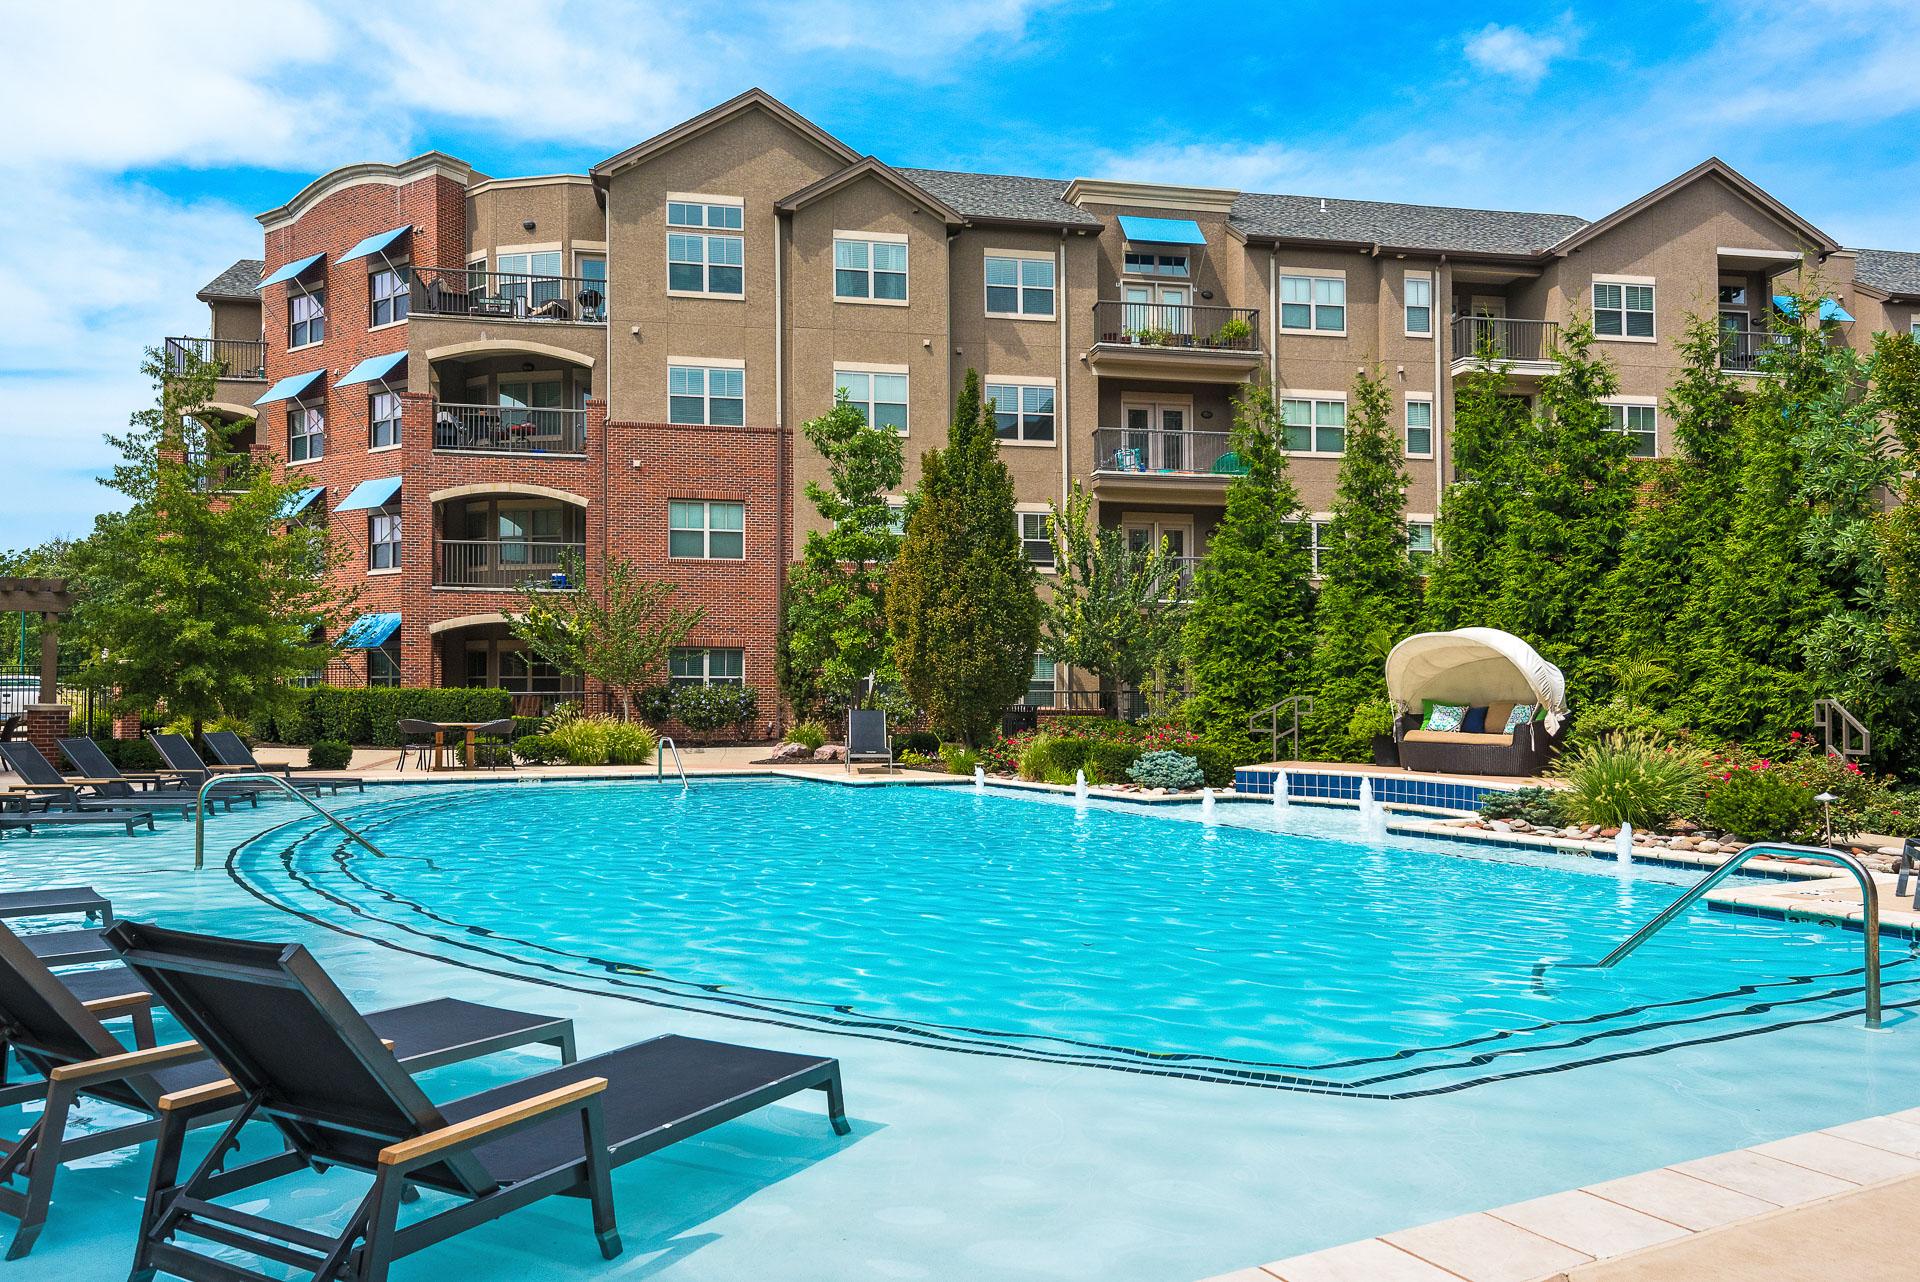 Sherpa Media Kansas City - Apartments & Multi-Family Housing - 27